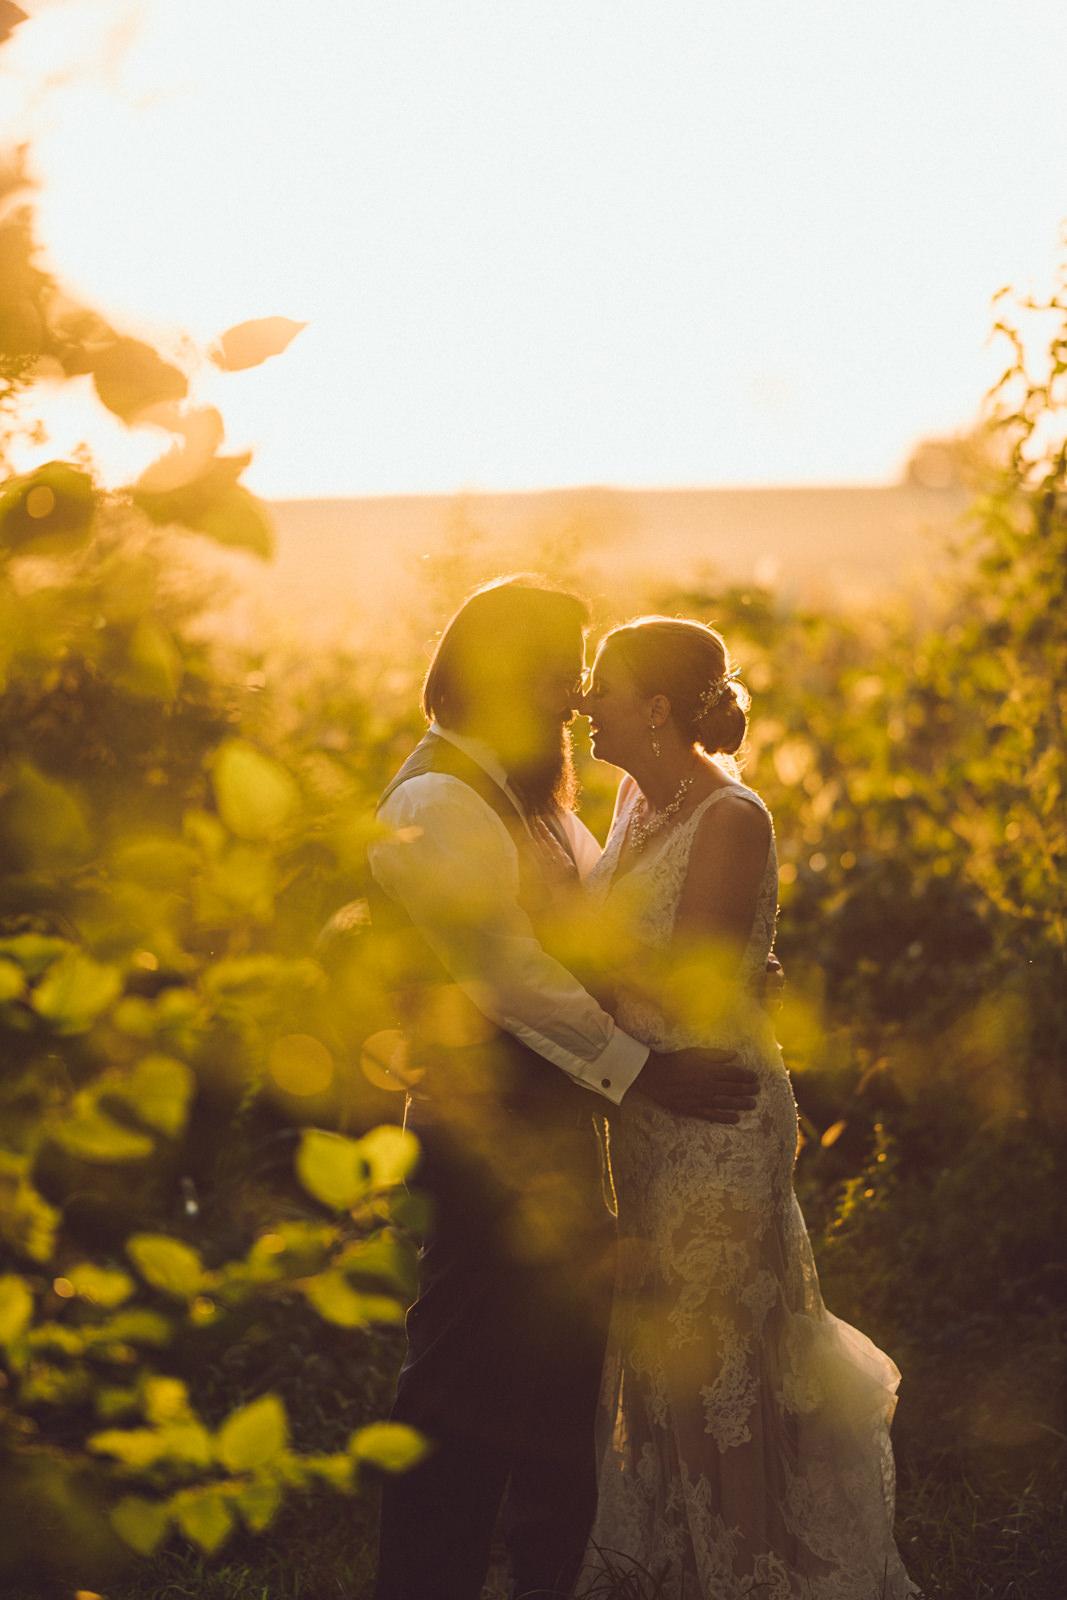 wedding-keely-caleb-1633-name-your-photo.jpg